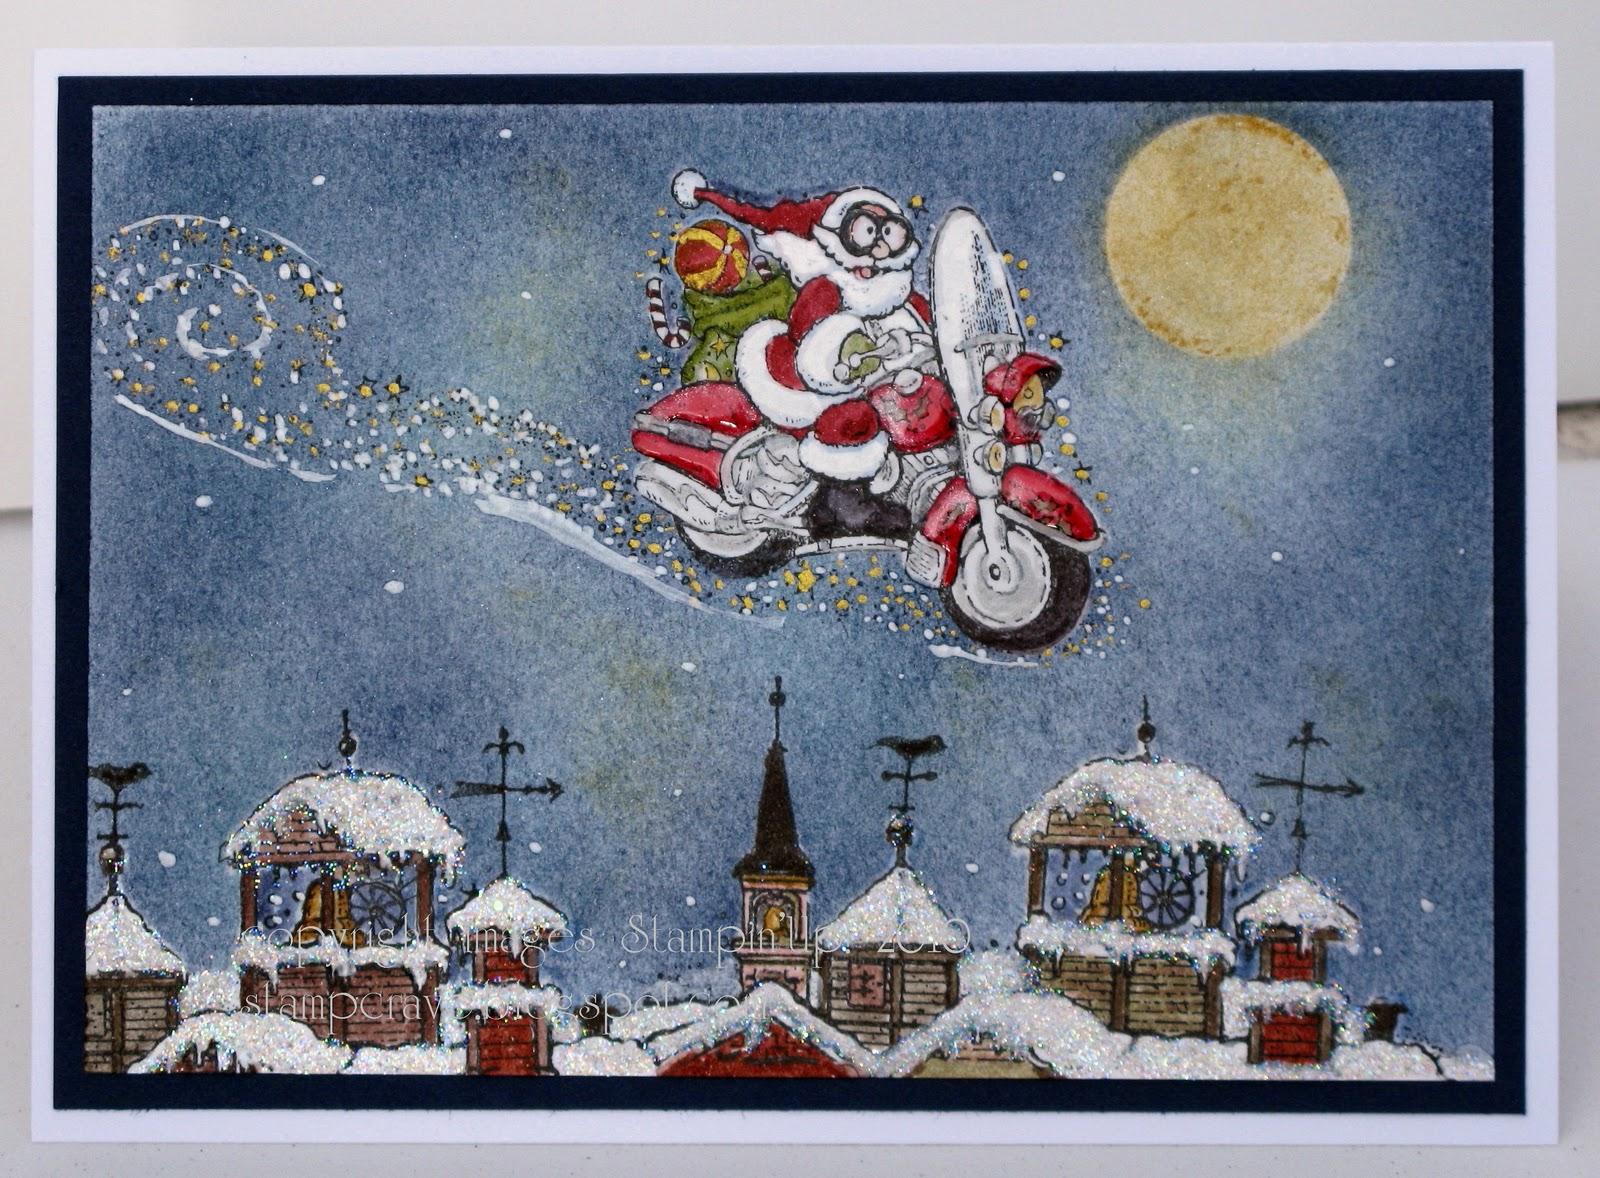 Stampcrave: Live To Ride Santa